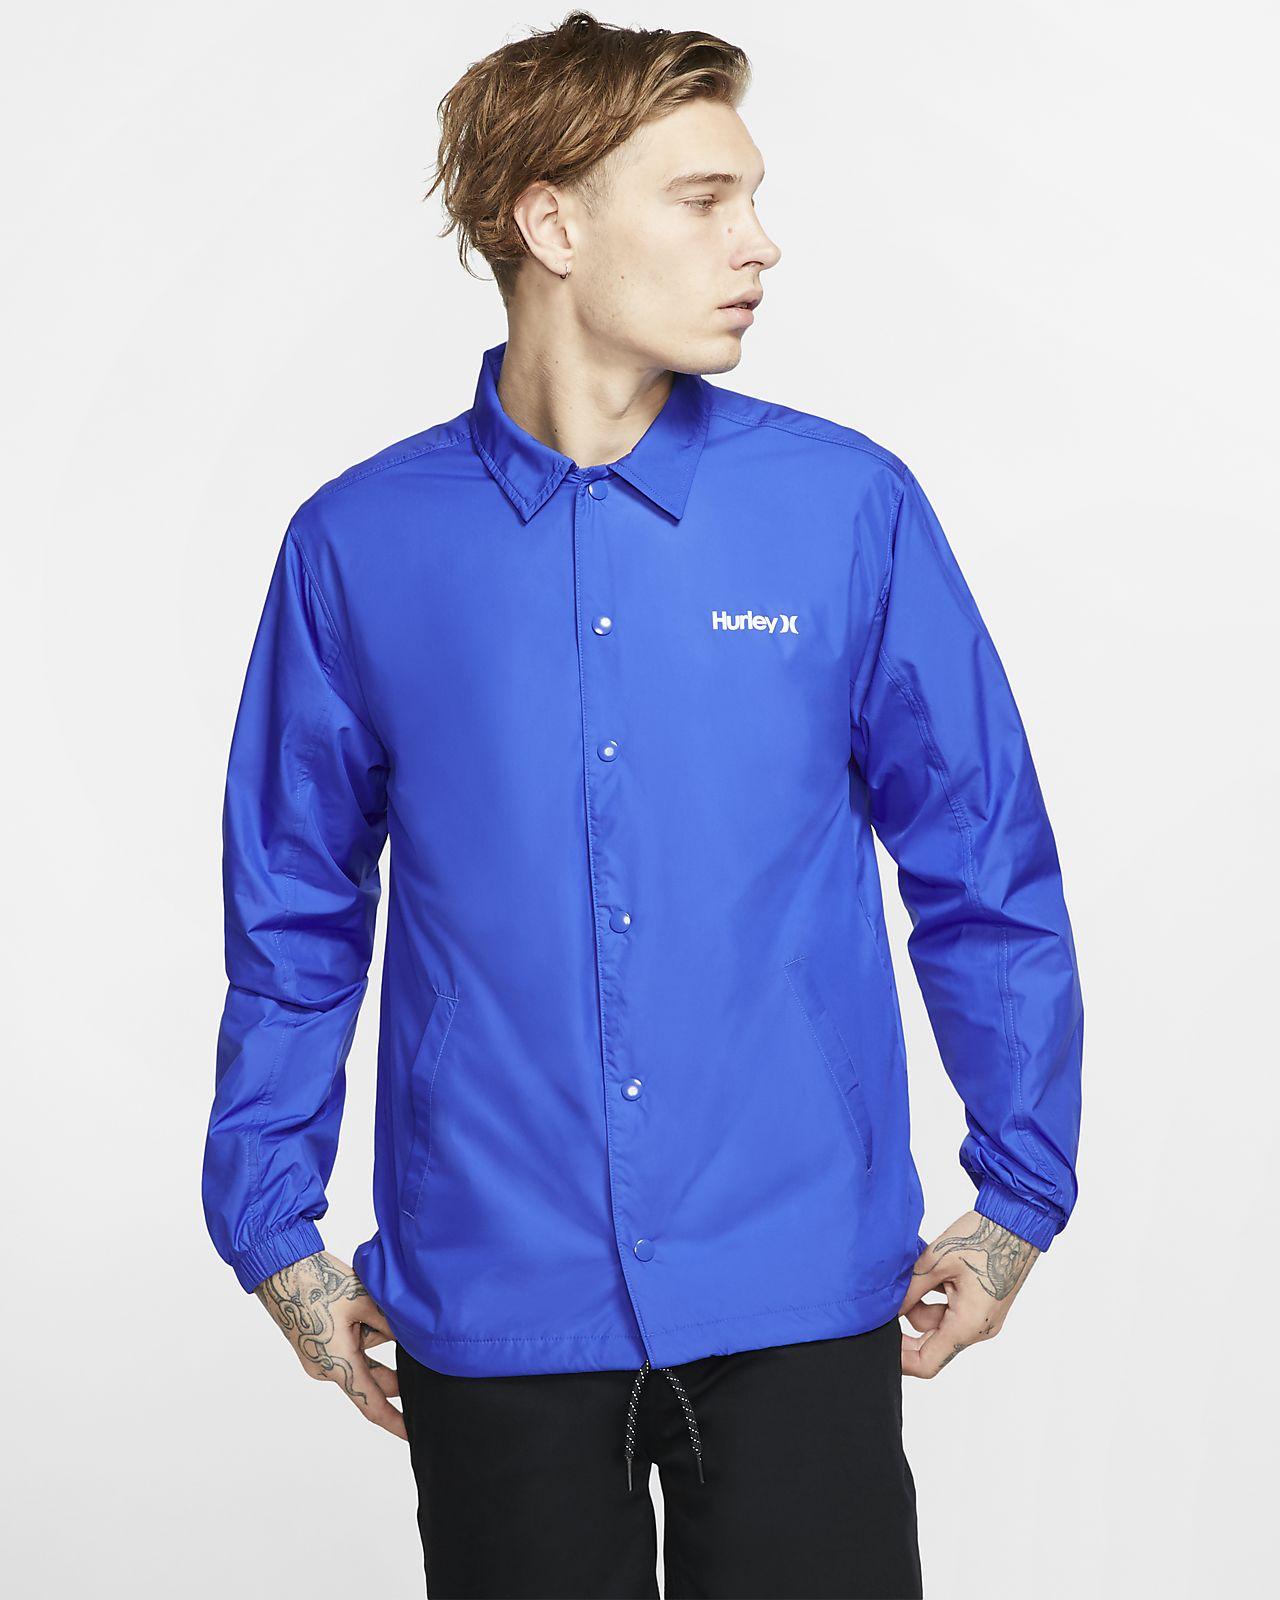 Hurley Siege Coaches Men's Jacket